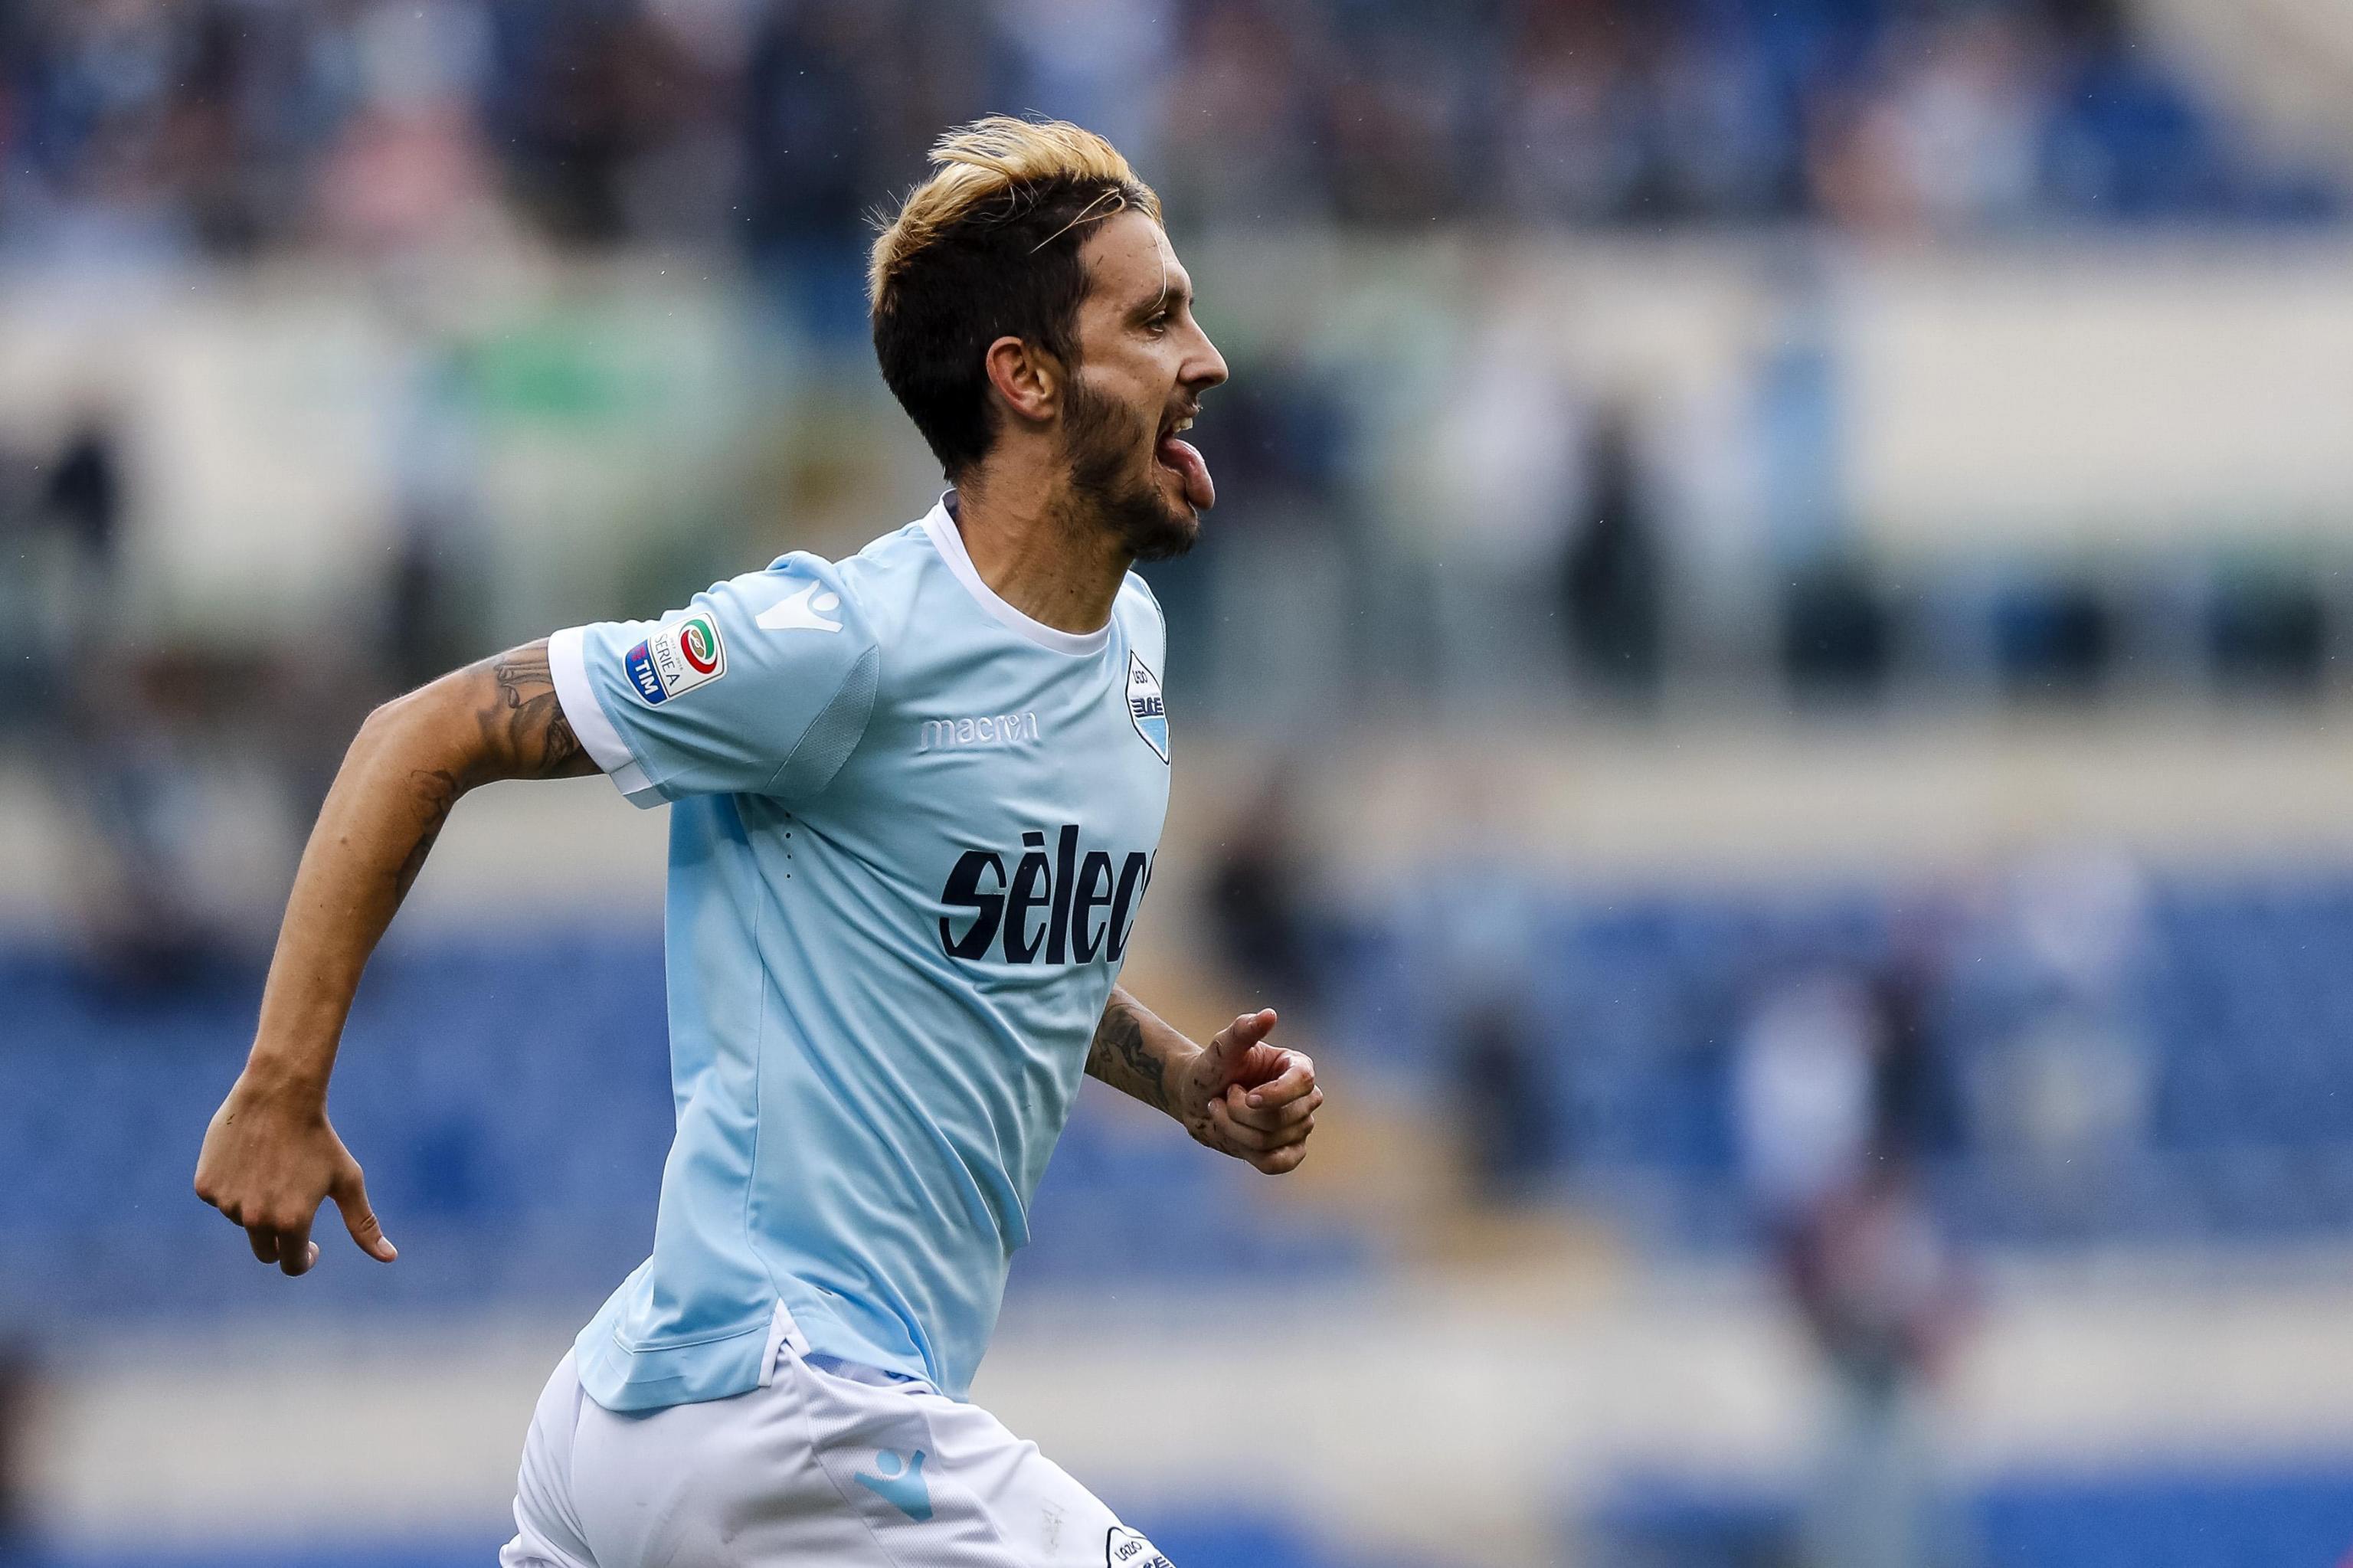 Luis Alberto celebrates scoring a brilliant free kick against Sassuolo